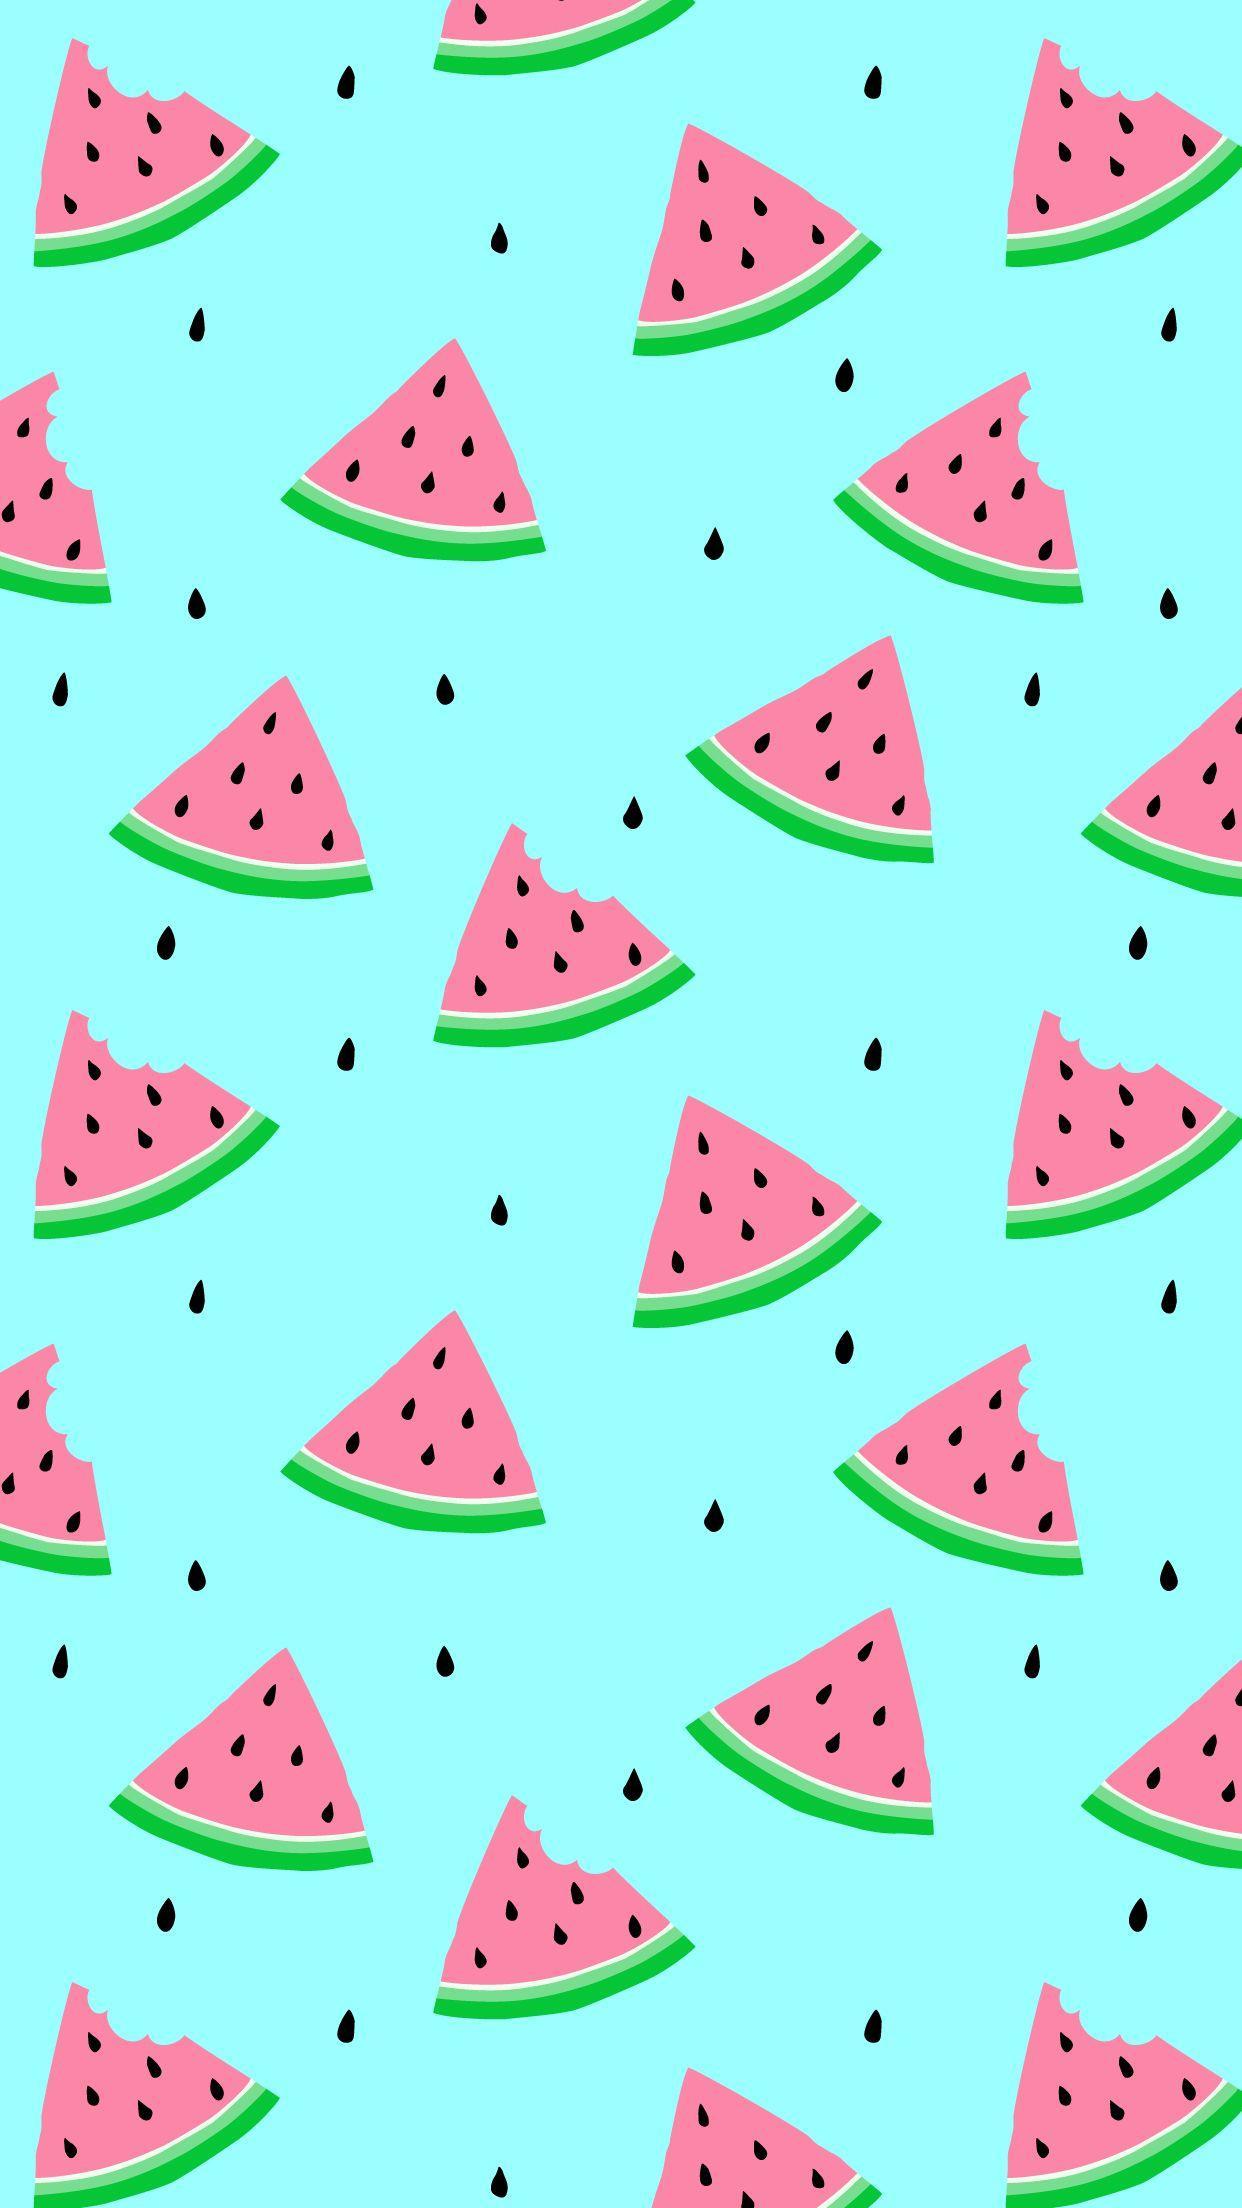 Cartoon Watermelon Wallpapers - Top Free Cartoon ...